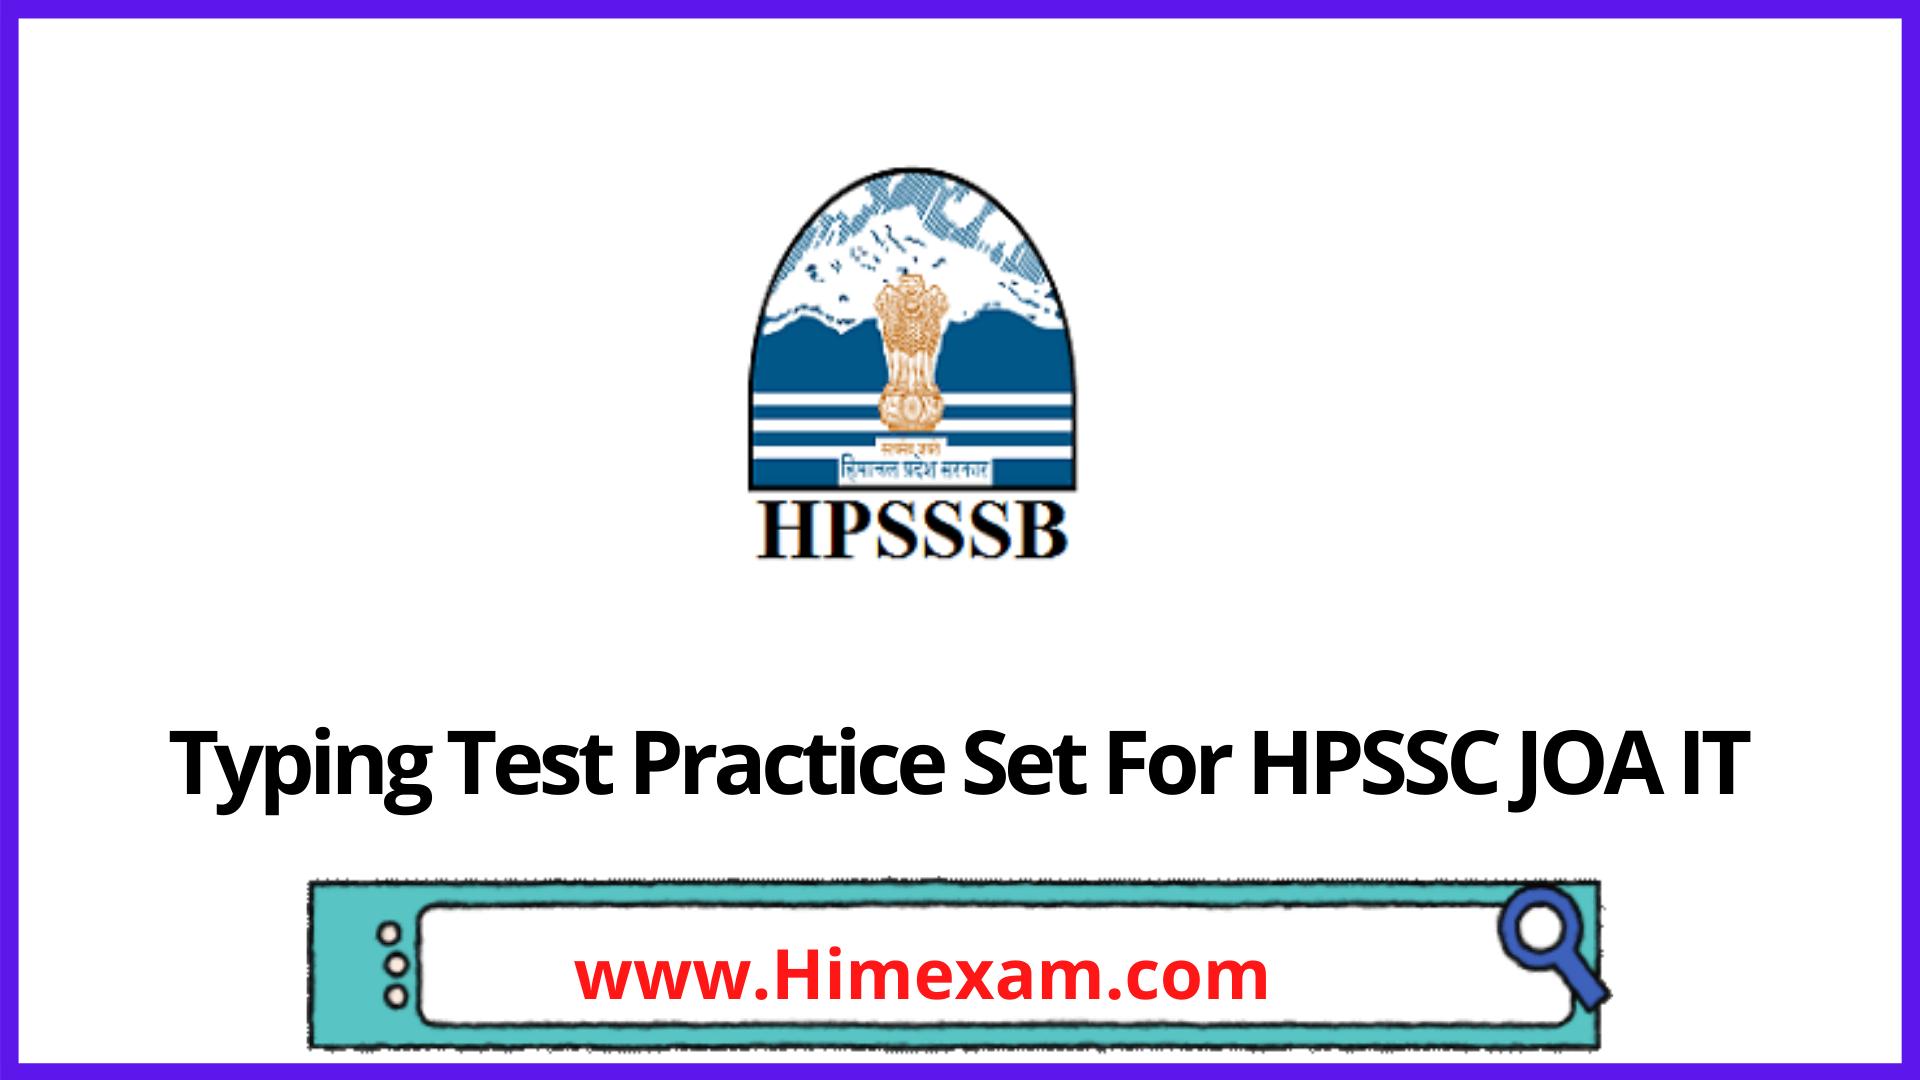 Typing Test Practice Set For HPSSC JOA IT